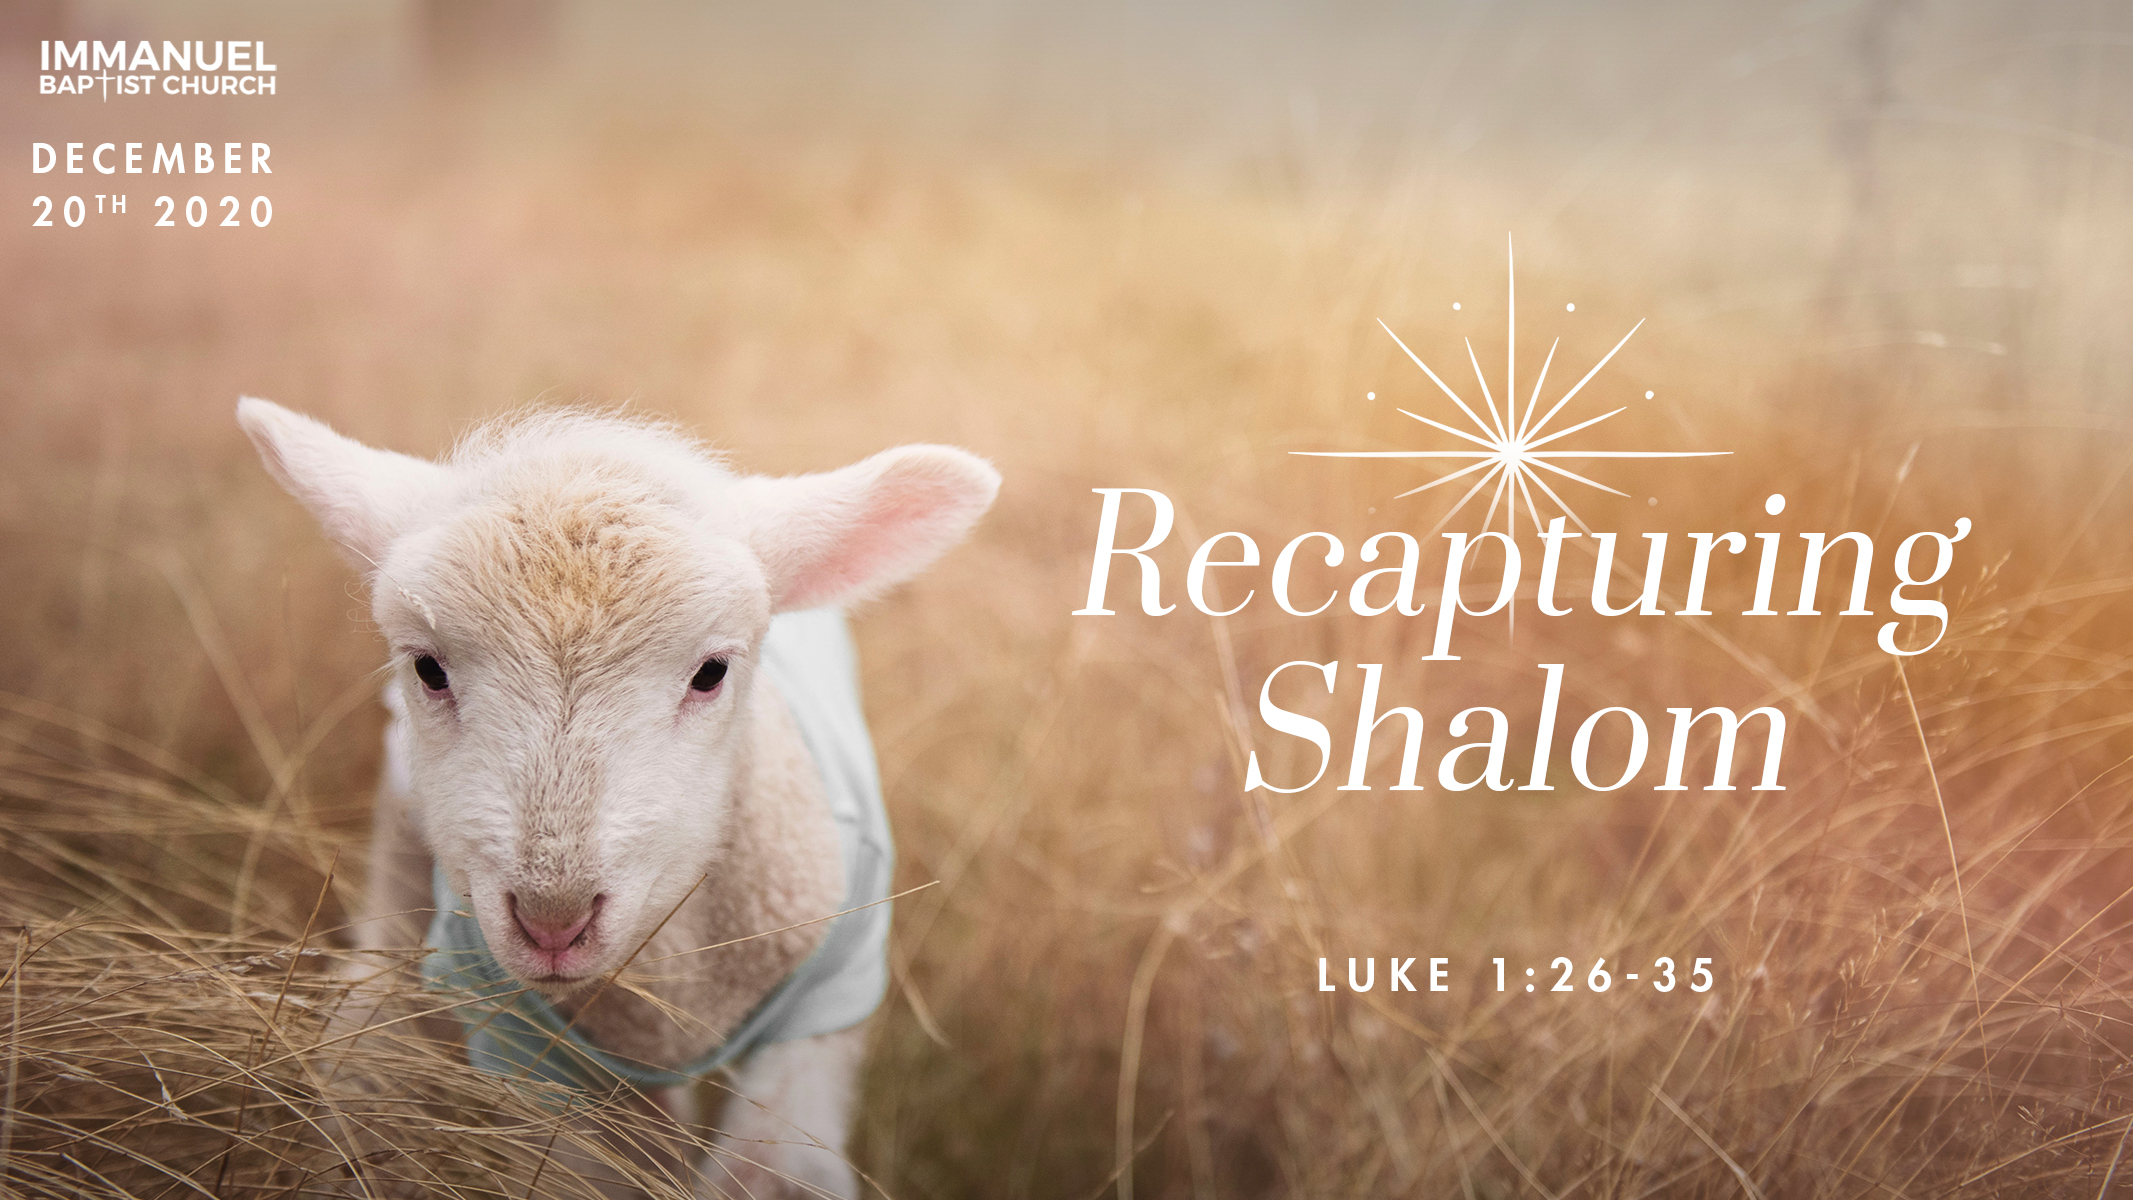 Recapturing Shalom